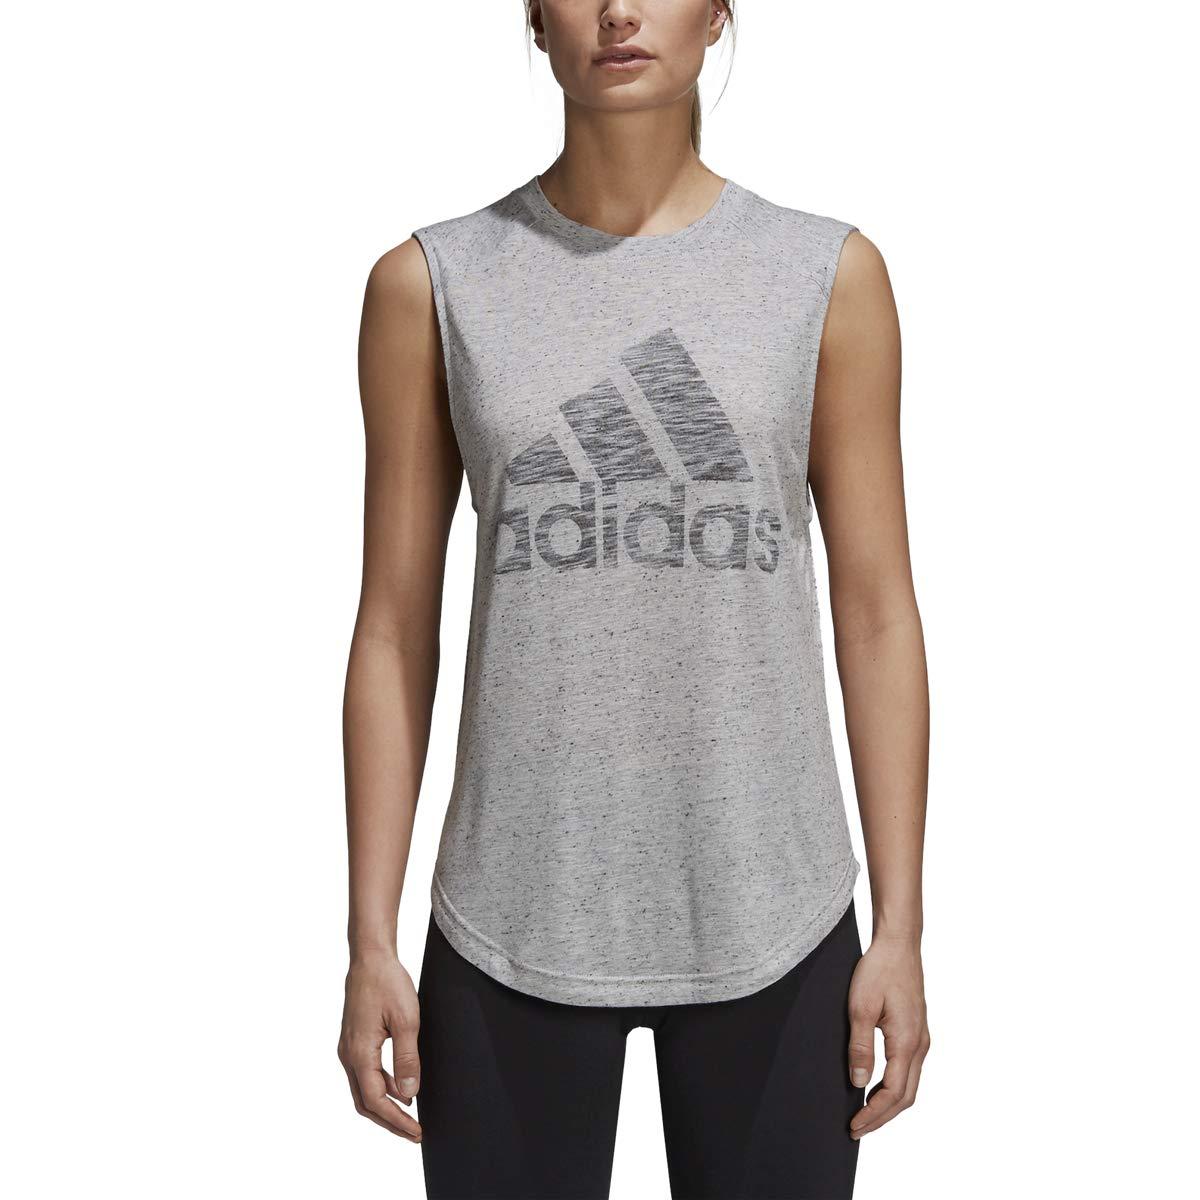 adidas Women's Winner Muscle Tank Top Mgh Solid Grey/Dgh Solid Grey Tank Top